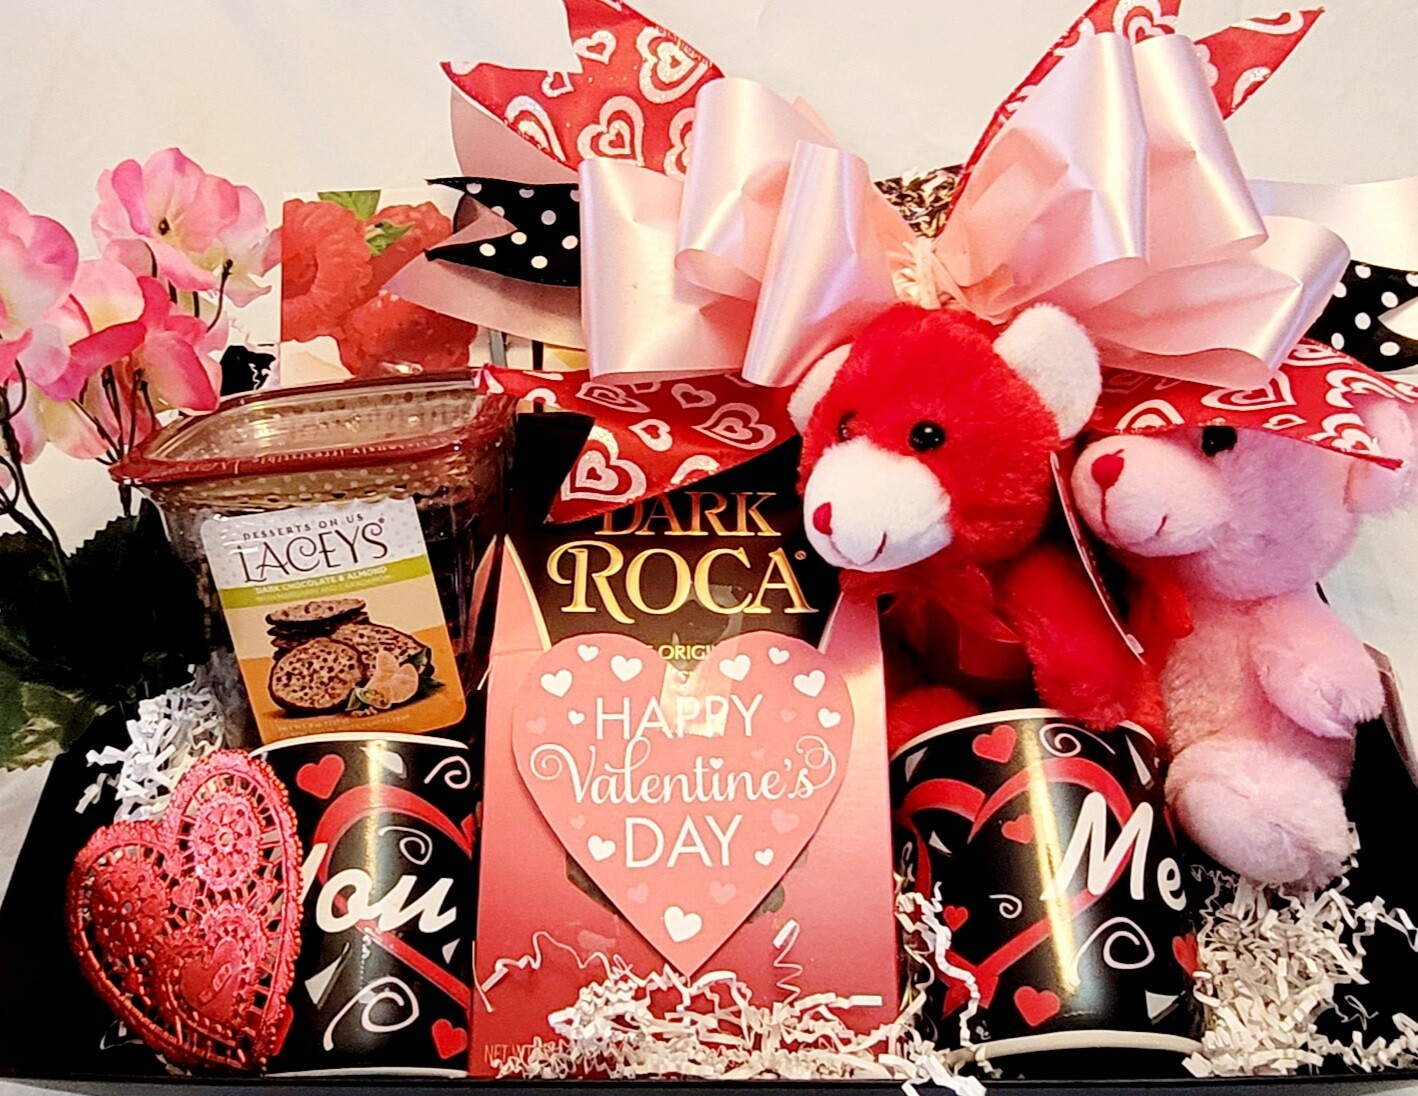 Valentine's Day 1 (Tea Lovers)